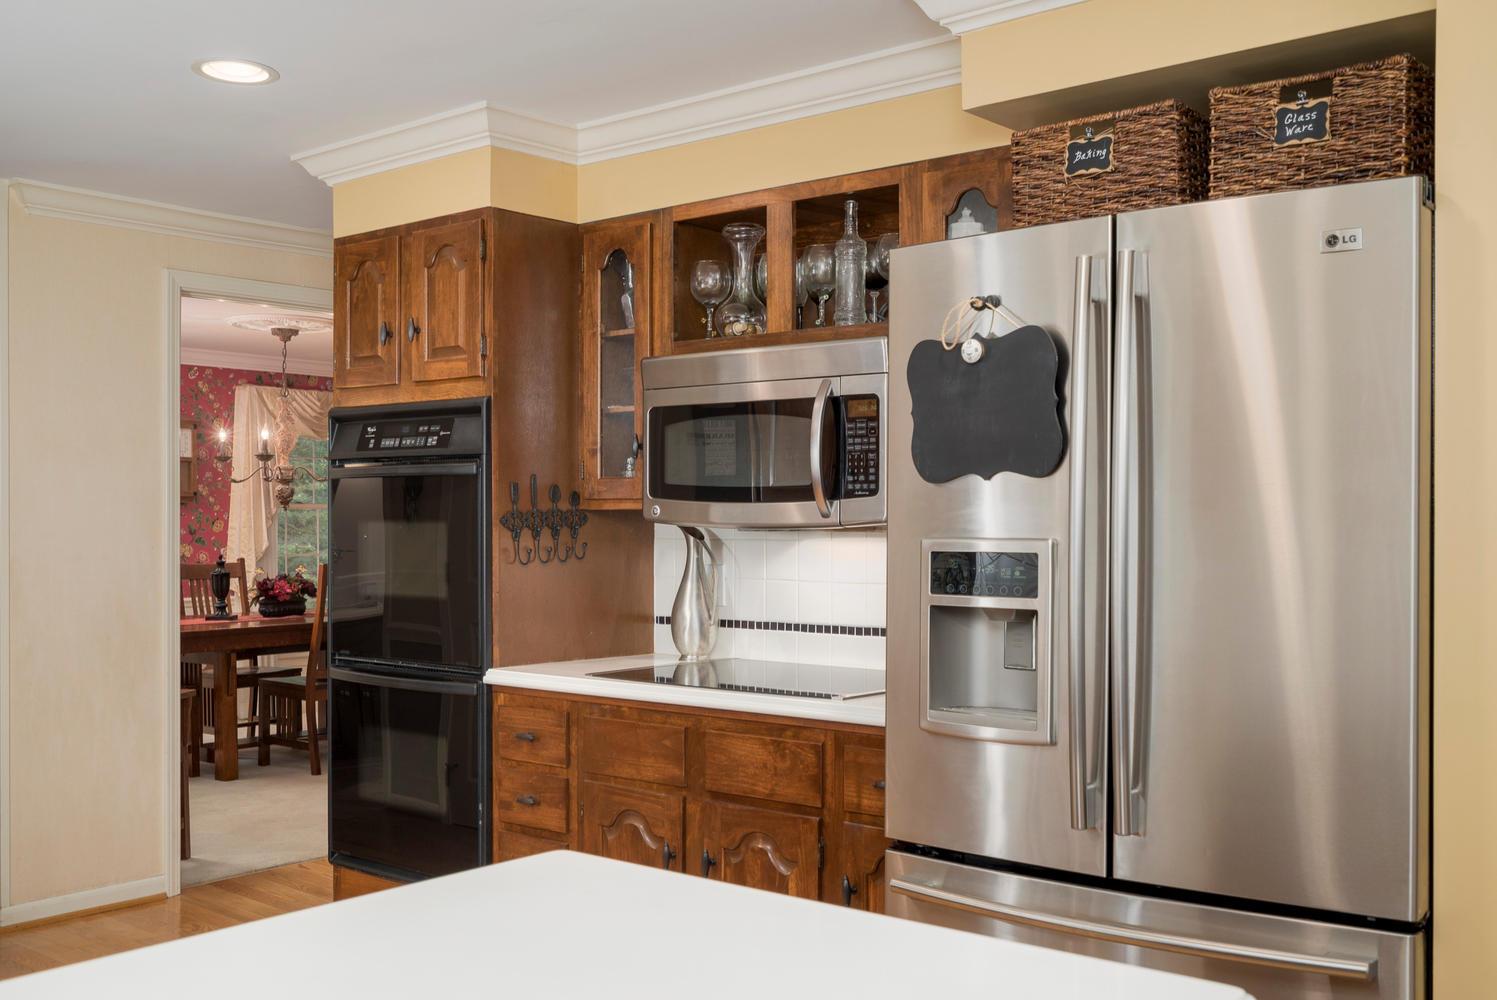 36 Timberlake Dr Orchard Park-large-011-9-Kitchen-1498x1000-72dpi